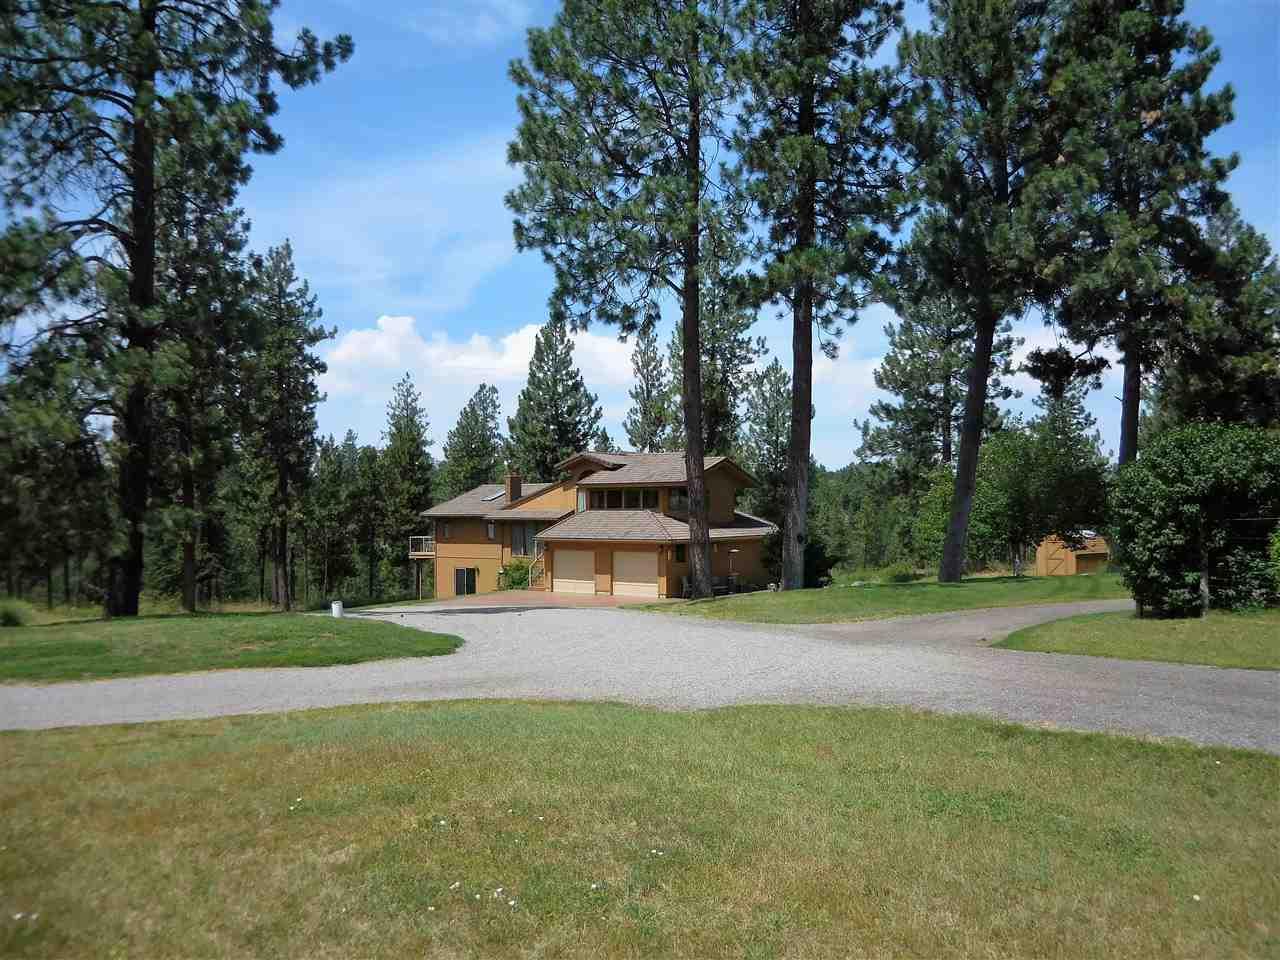 Single Family Home for Sale at 4708 S Long Lane 4708 S Long Lane Greenacres, Washington 99016 United States